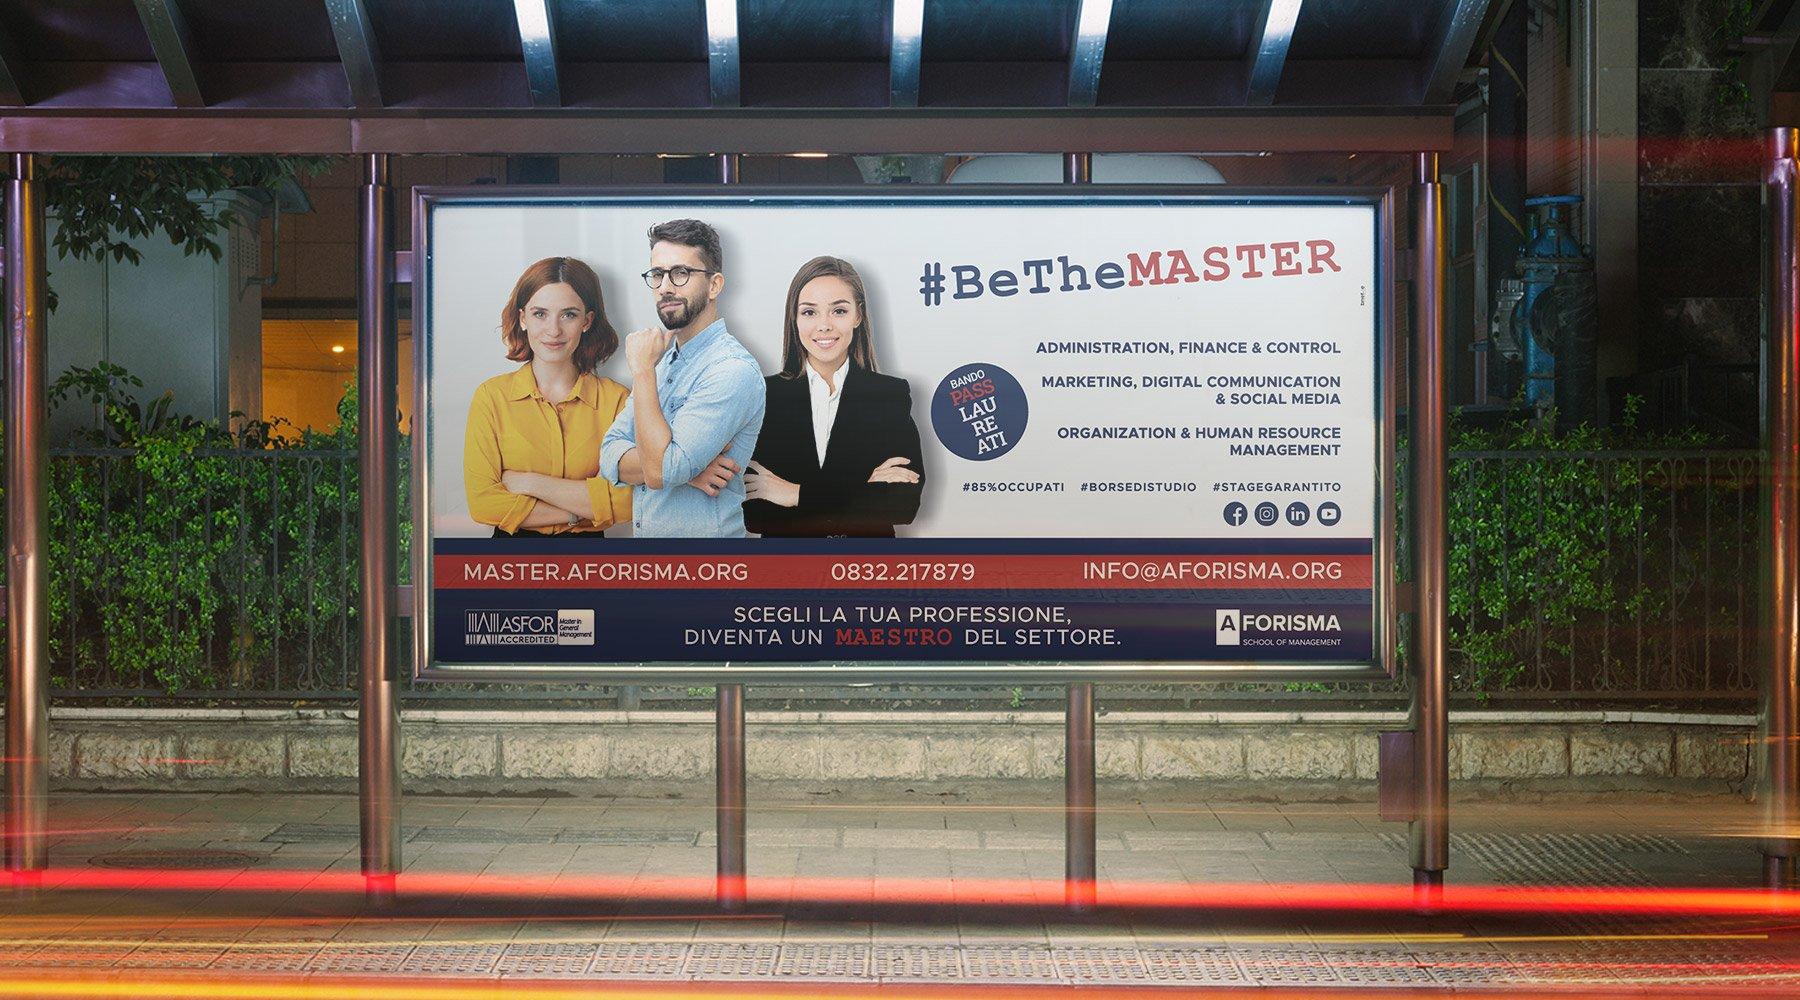 BriefMe_AFORISMA_img_bethemaster_billboard